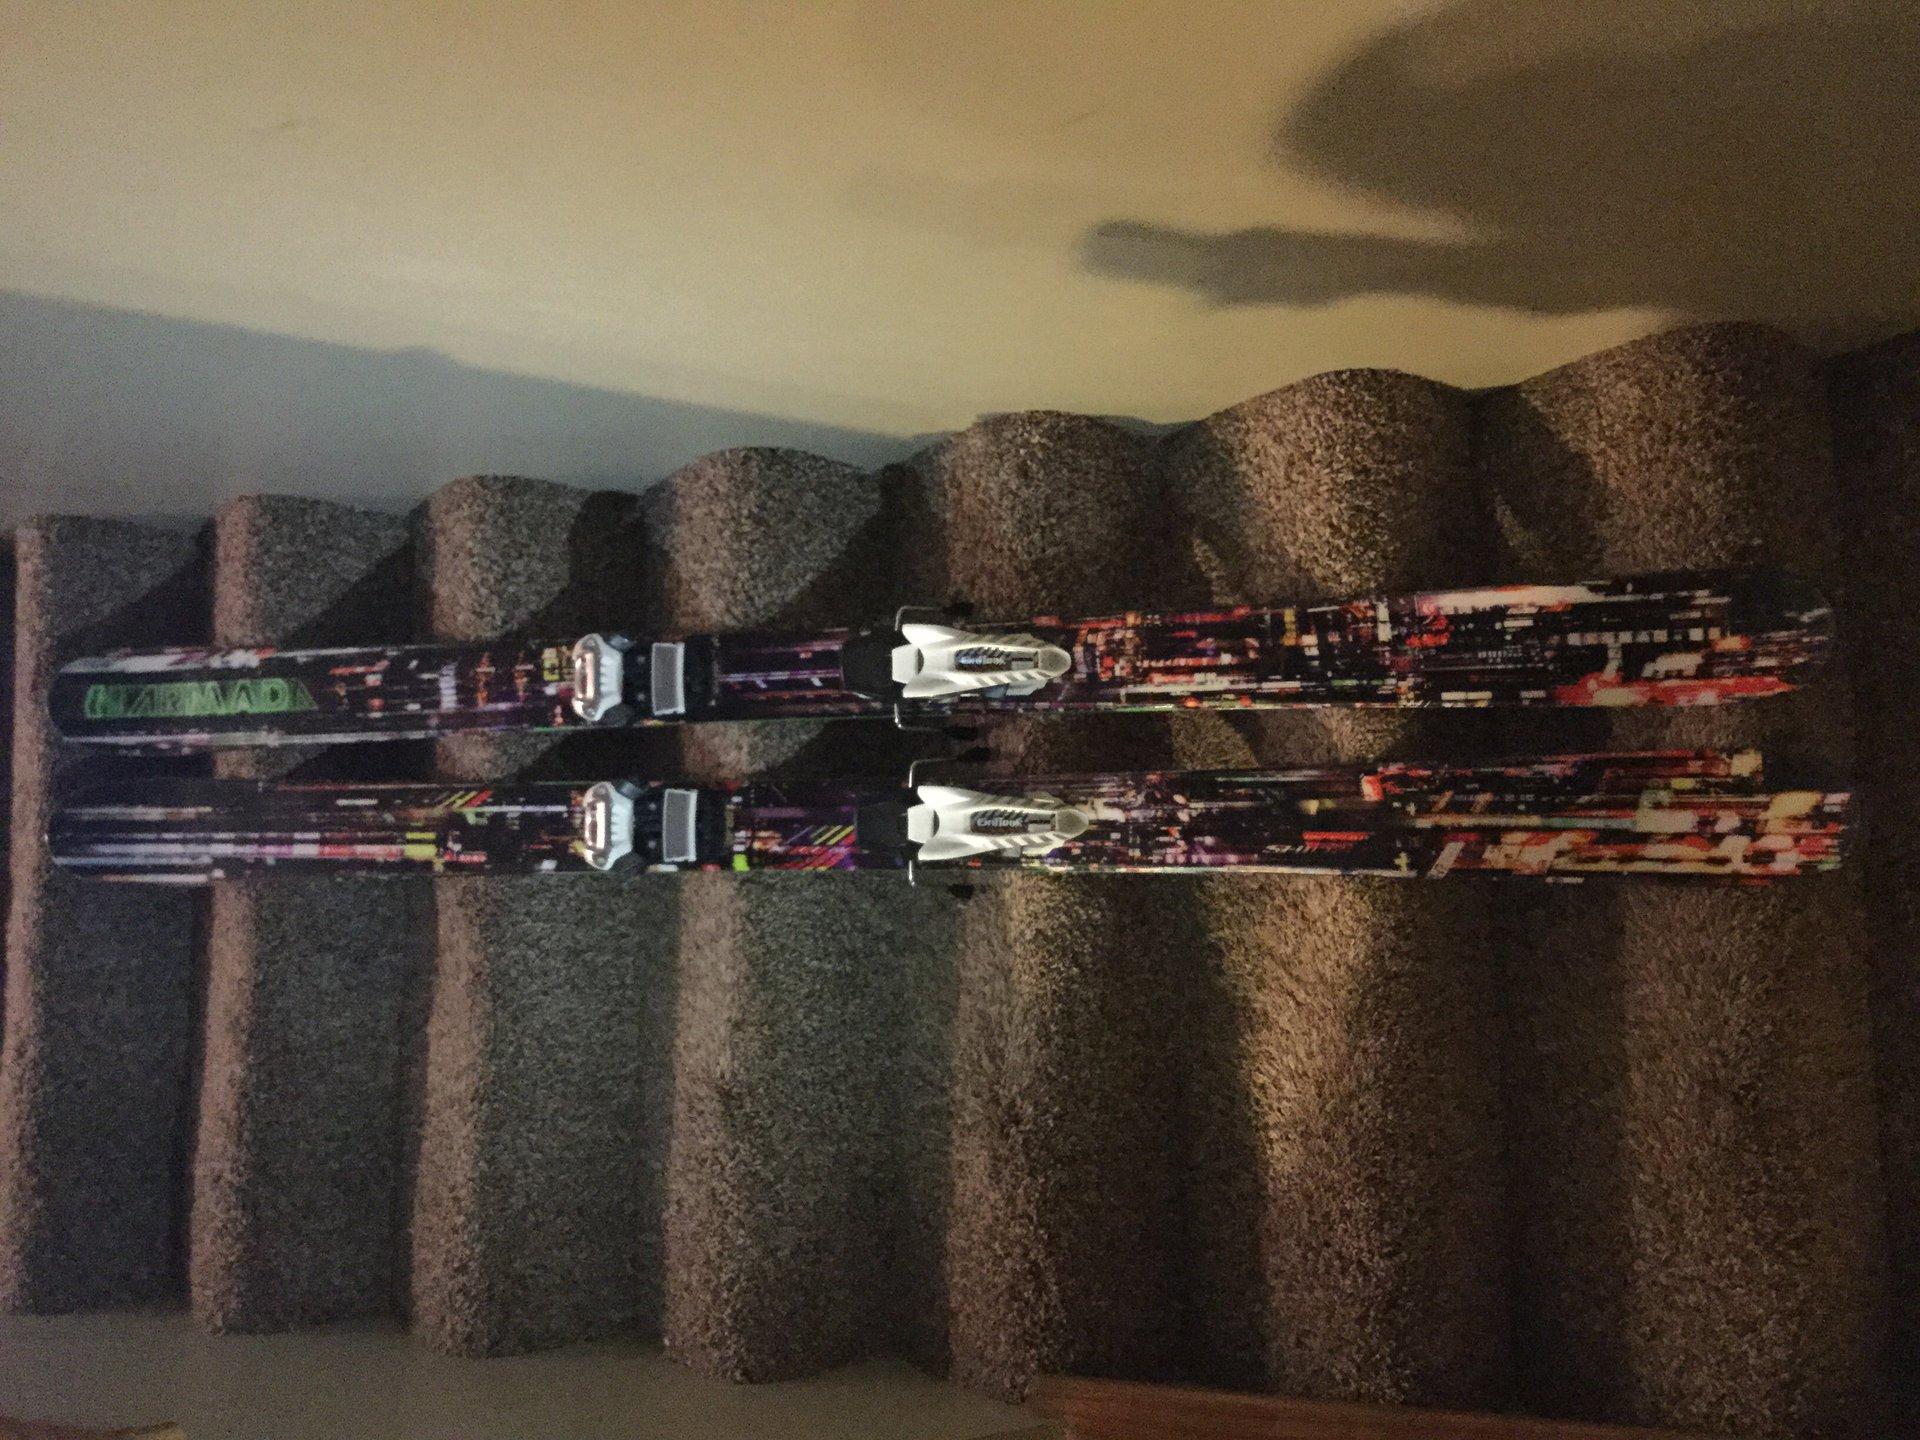 Armada Ar7 2015 skis and head ski boots size 27.5